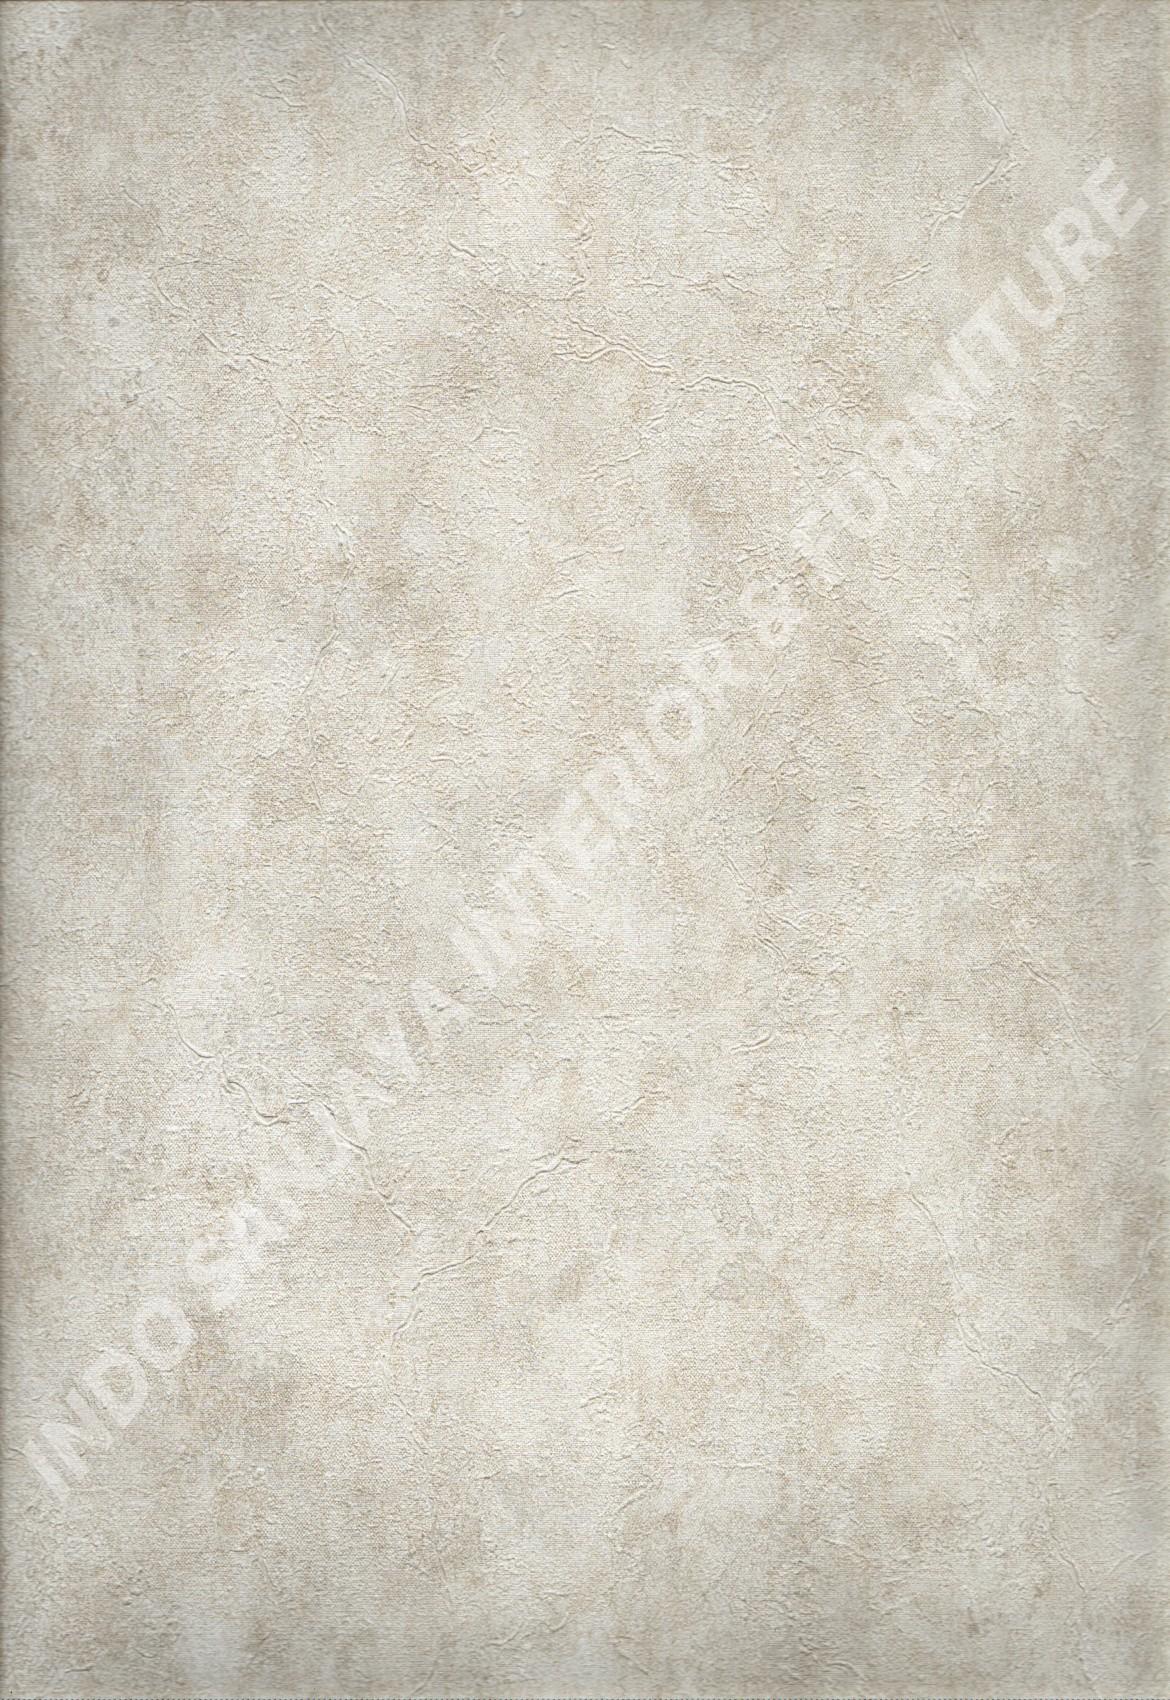 wallpaper   Wallpaper Minimalis Polos DL12003:DL12003 corak  warna